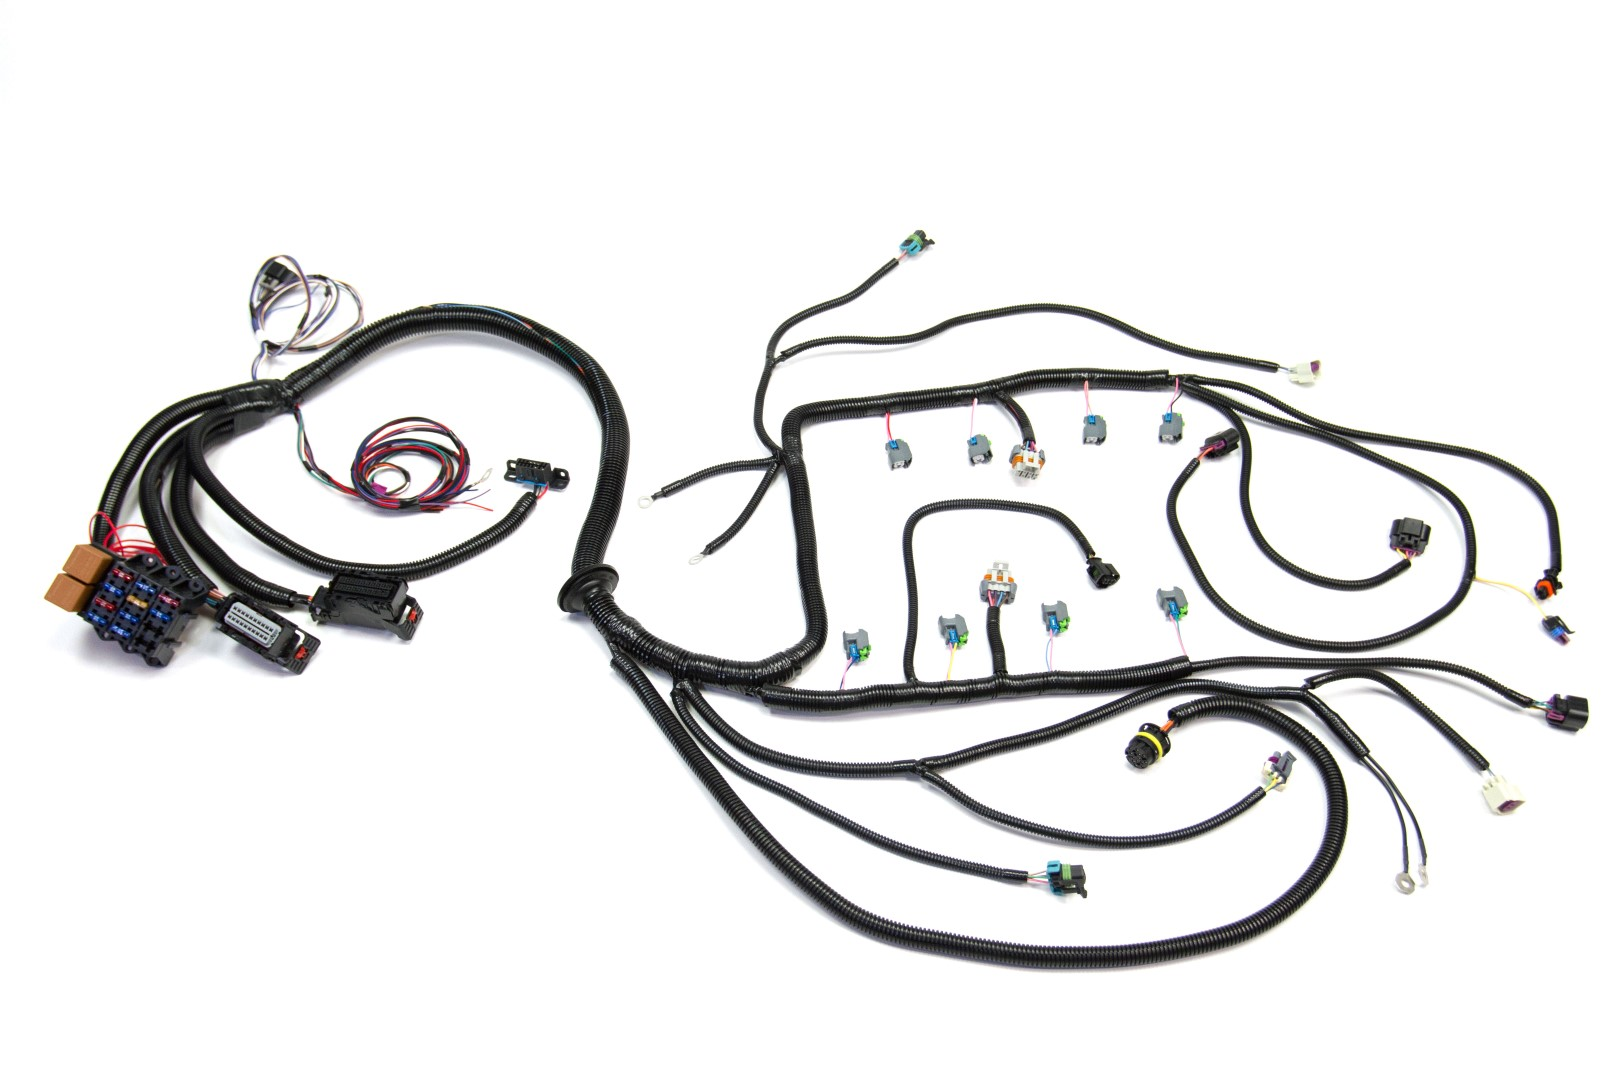 tags: #c3 corvette headlight conversion kit#1968 corvette wiring schematic#c3  corvette e brake#c3 corvette fuse panel 81#69 corvette wiper wiring#69